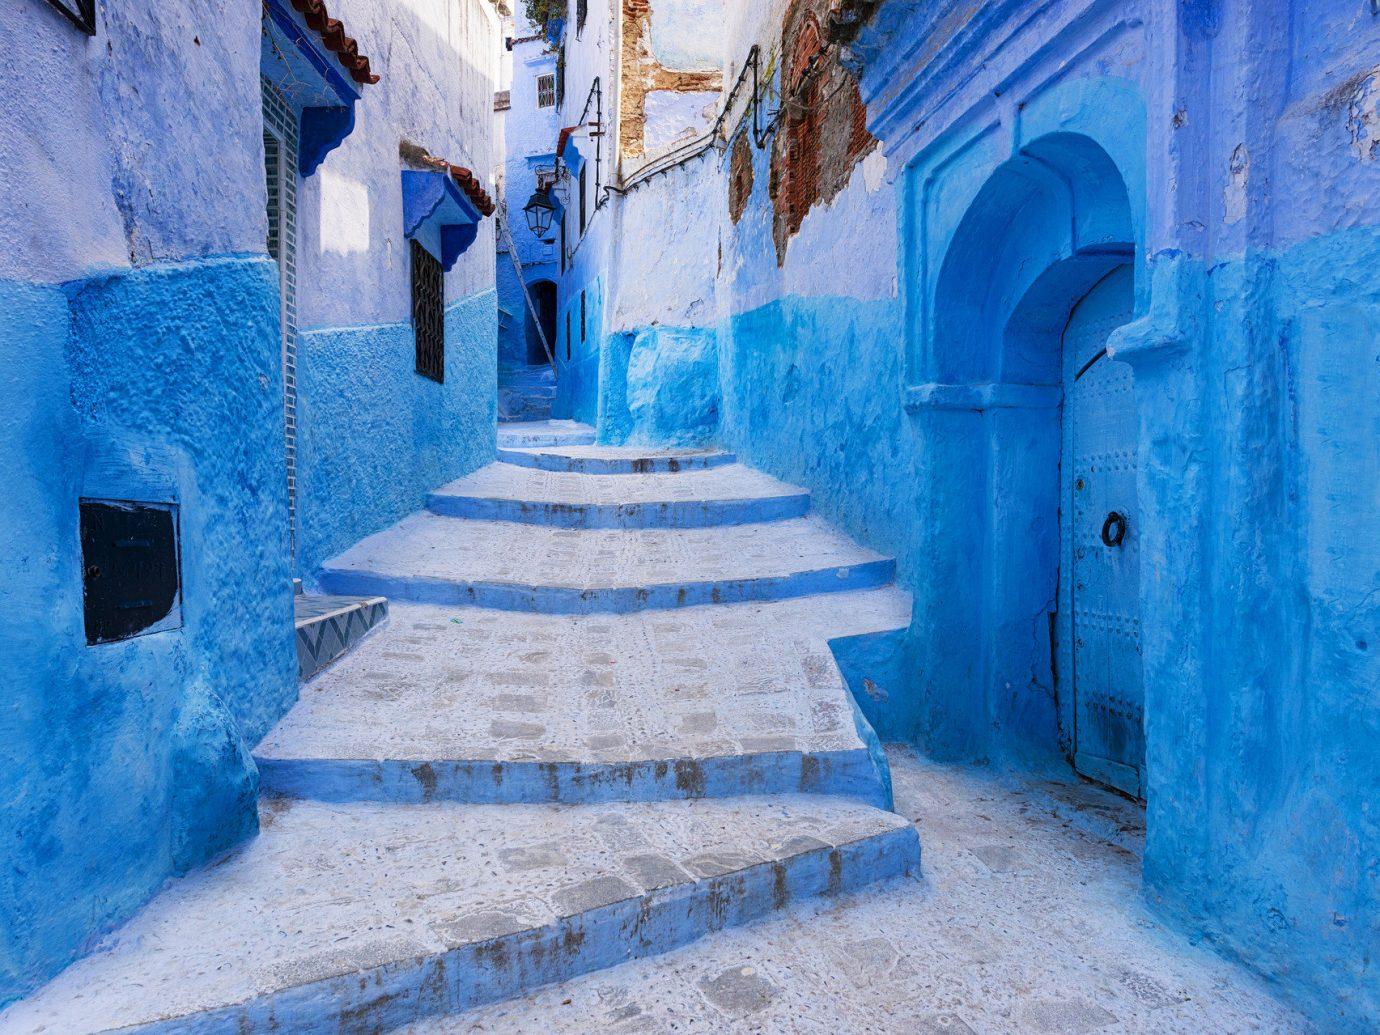 Arts + Culture Marrakech Morocco Style + Design Trip Ideas building color blue Winter wall urban area freezing season snow ice concrete cement dirty